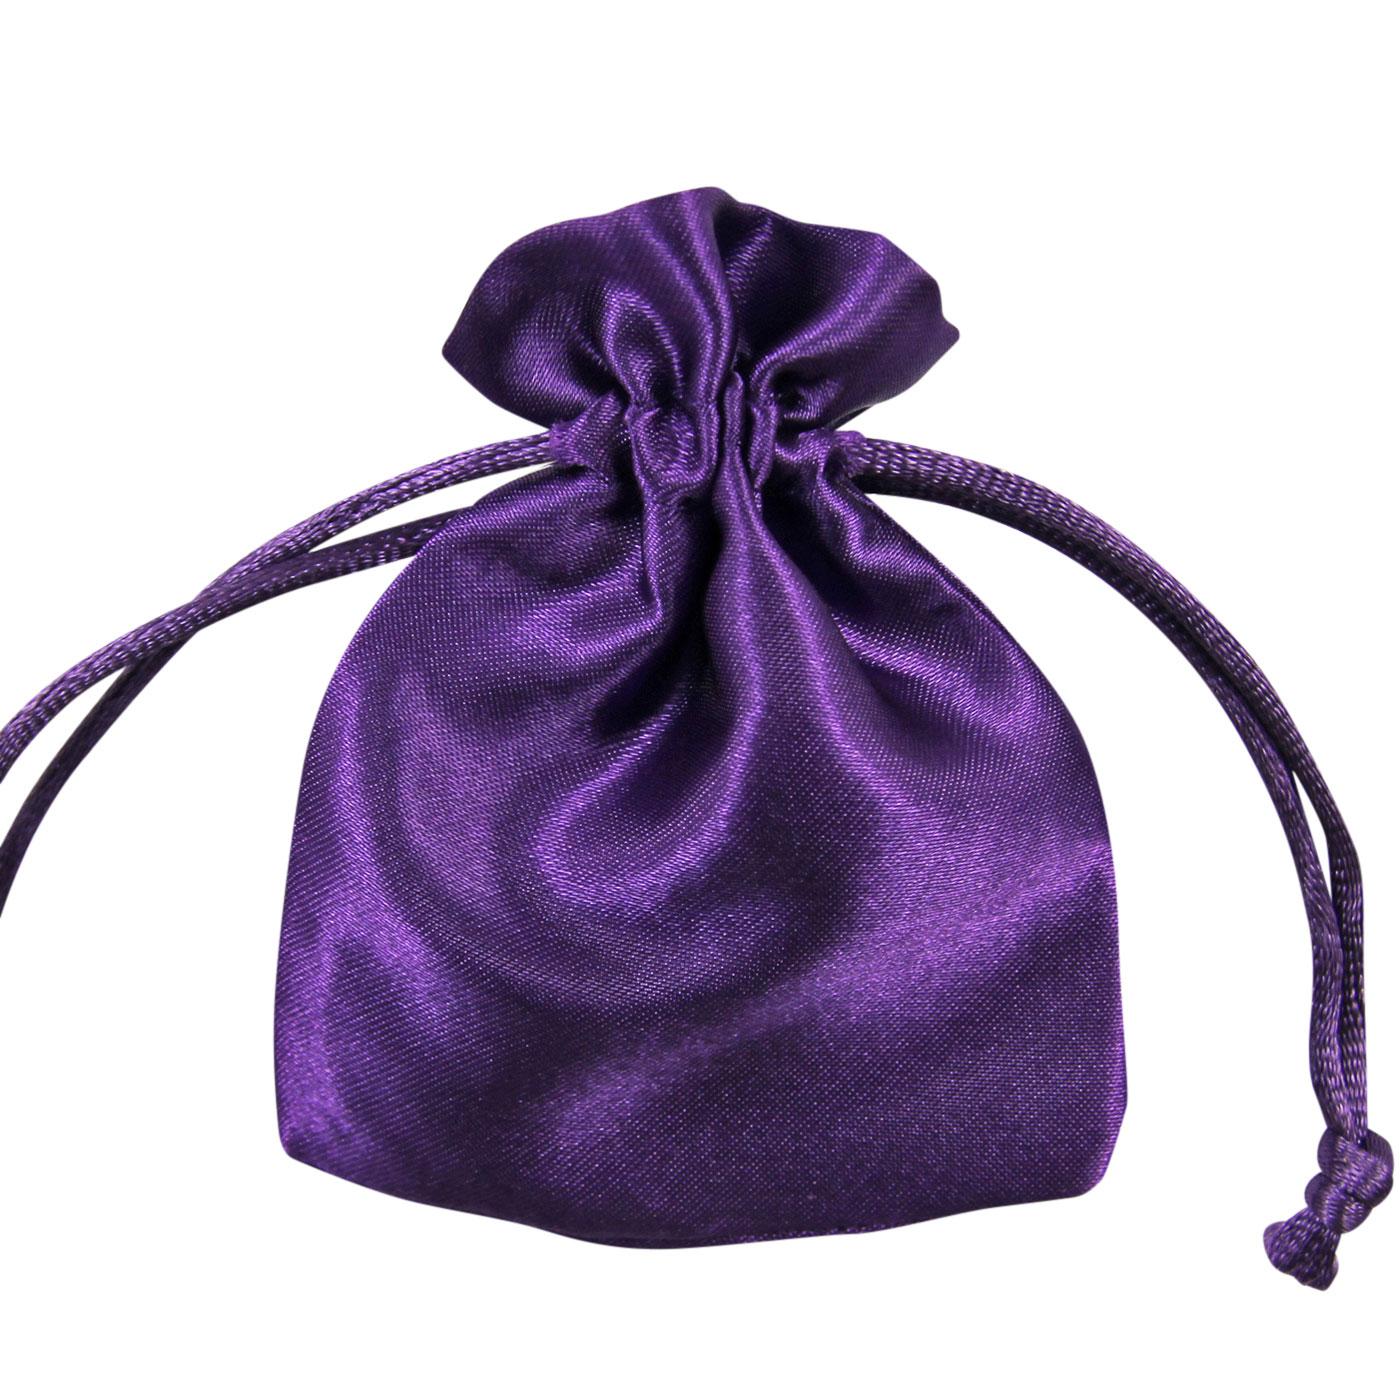 Satin jewellery drawstring gift bag favour xmas pouches